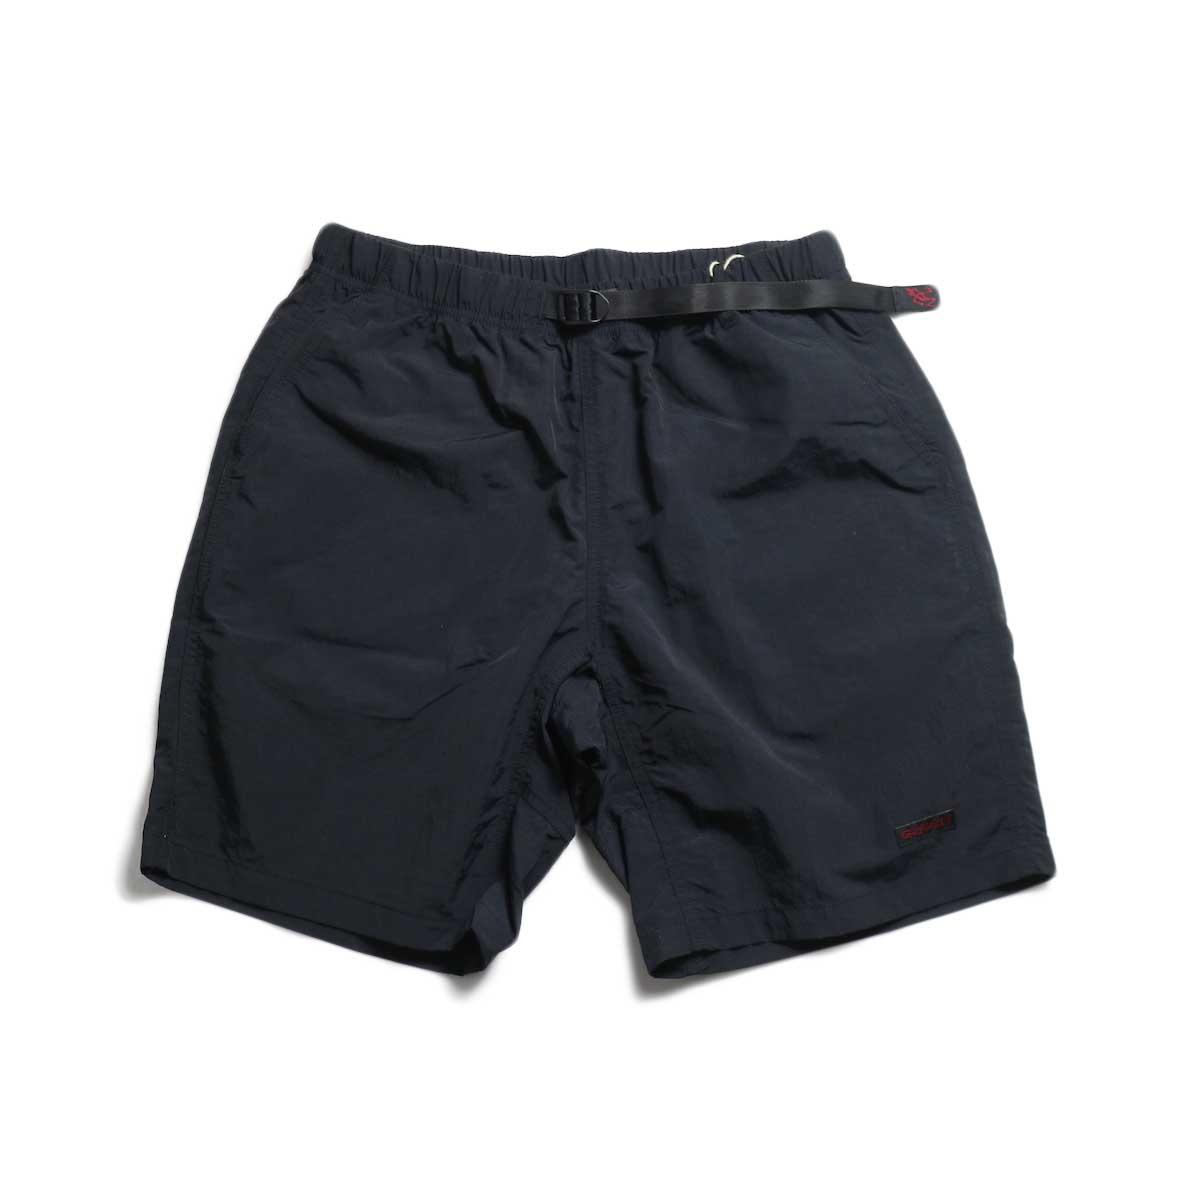 GRAMICCI / Shell Packable Shorts -Black